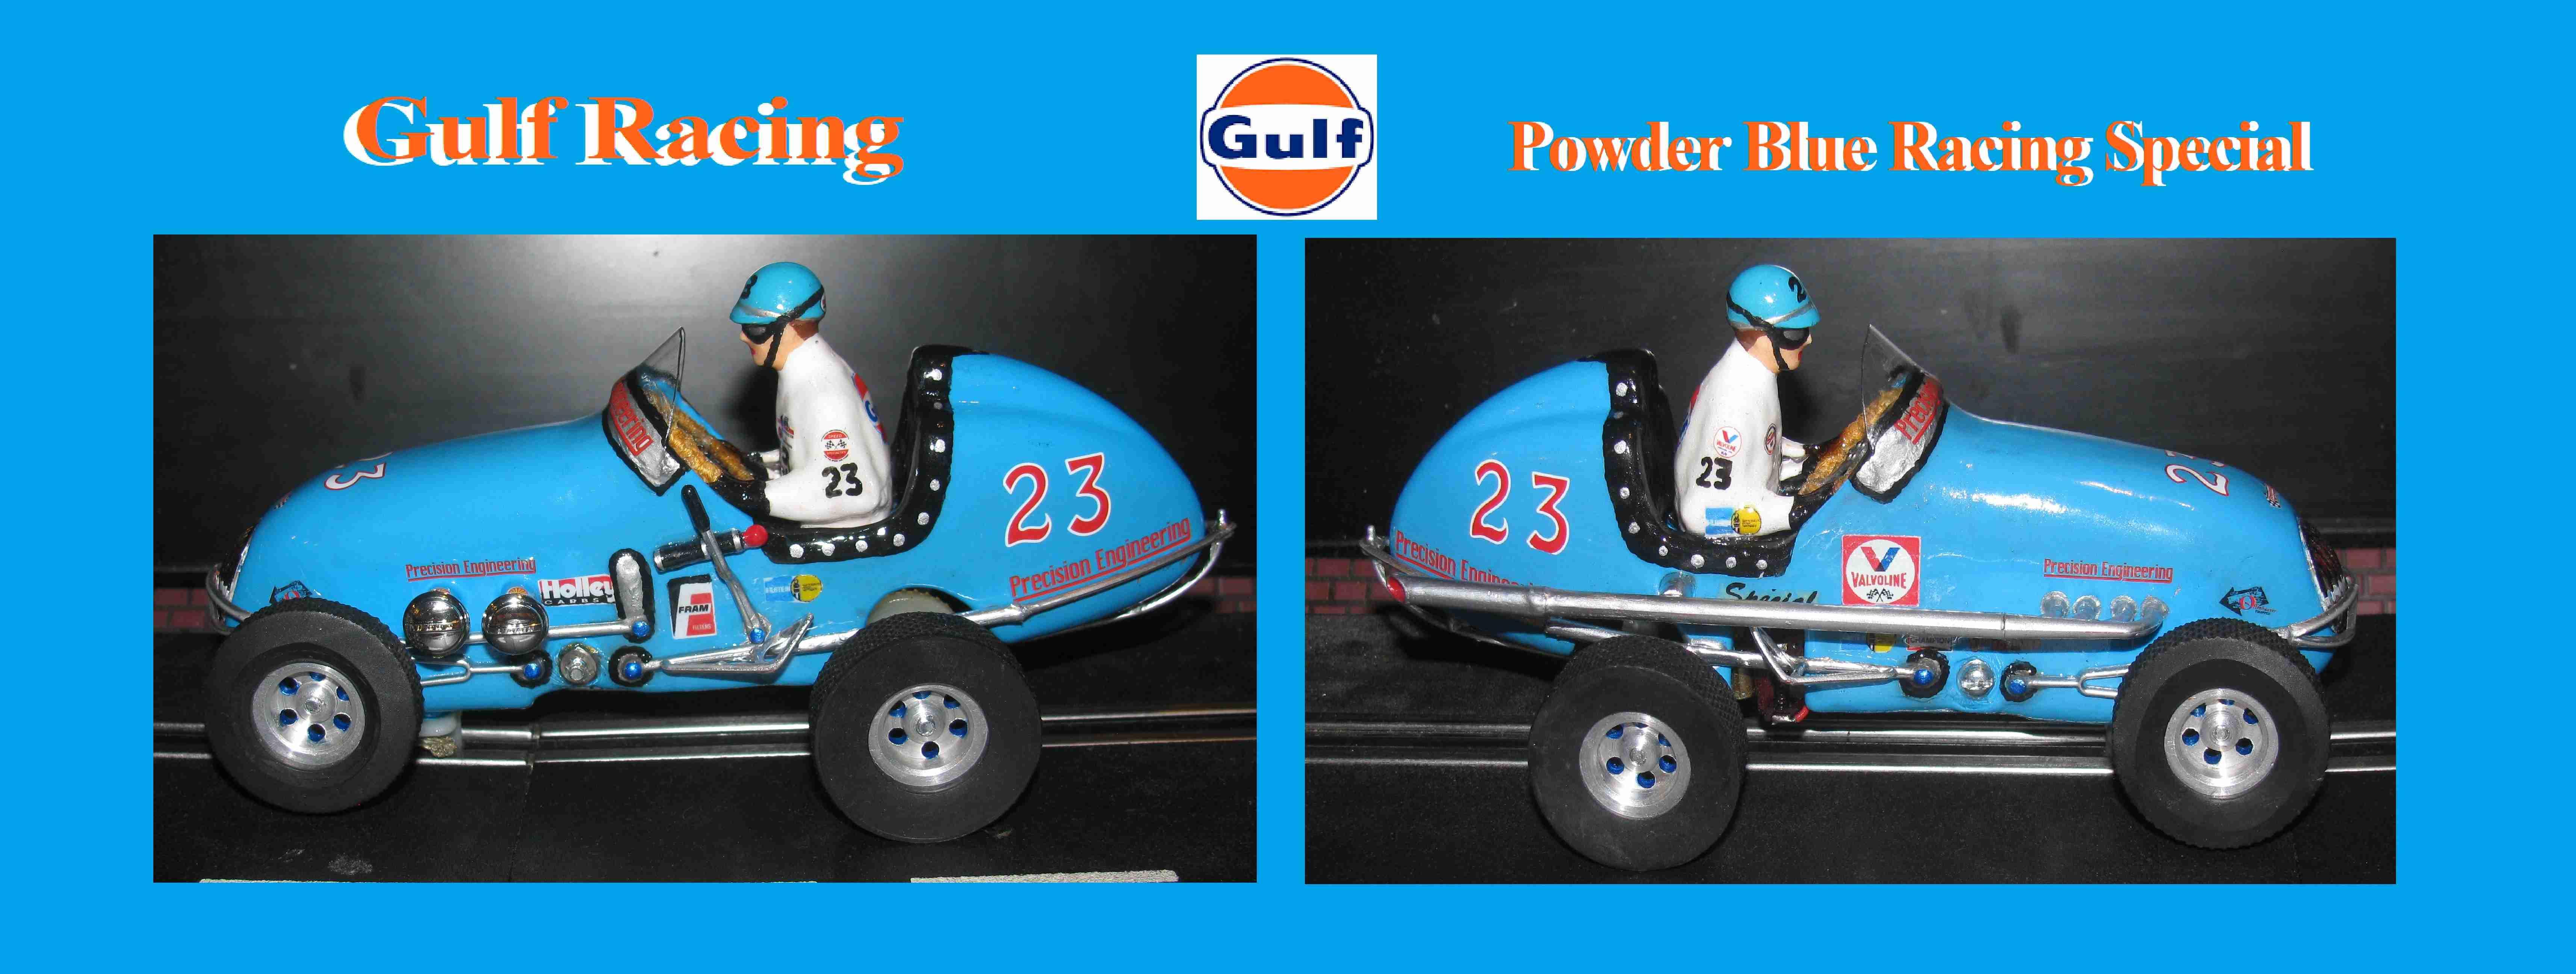 * SOLD * * SALE ENDS SUNDAY * Monogram Midget Racer Gulf Racing Special Powder Blue 1:24 Slot Car 23